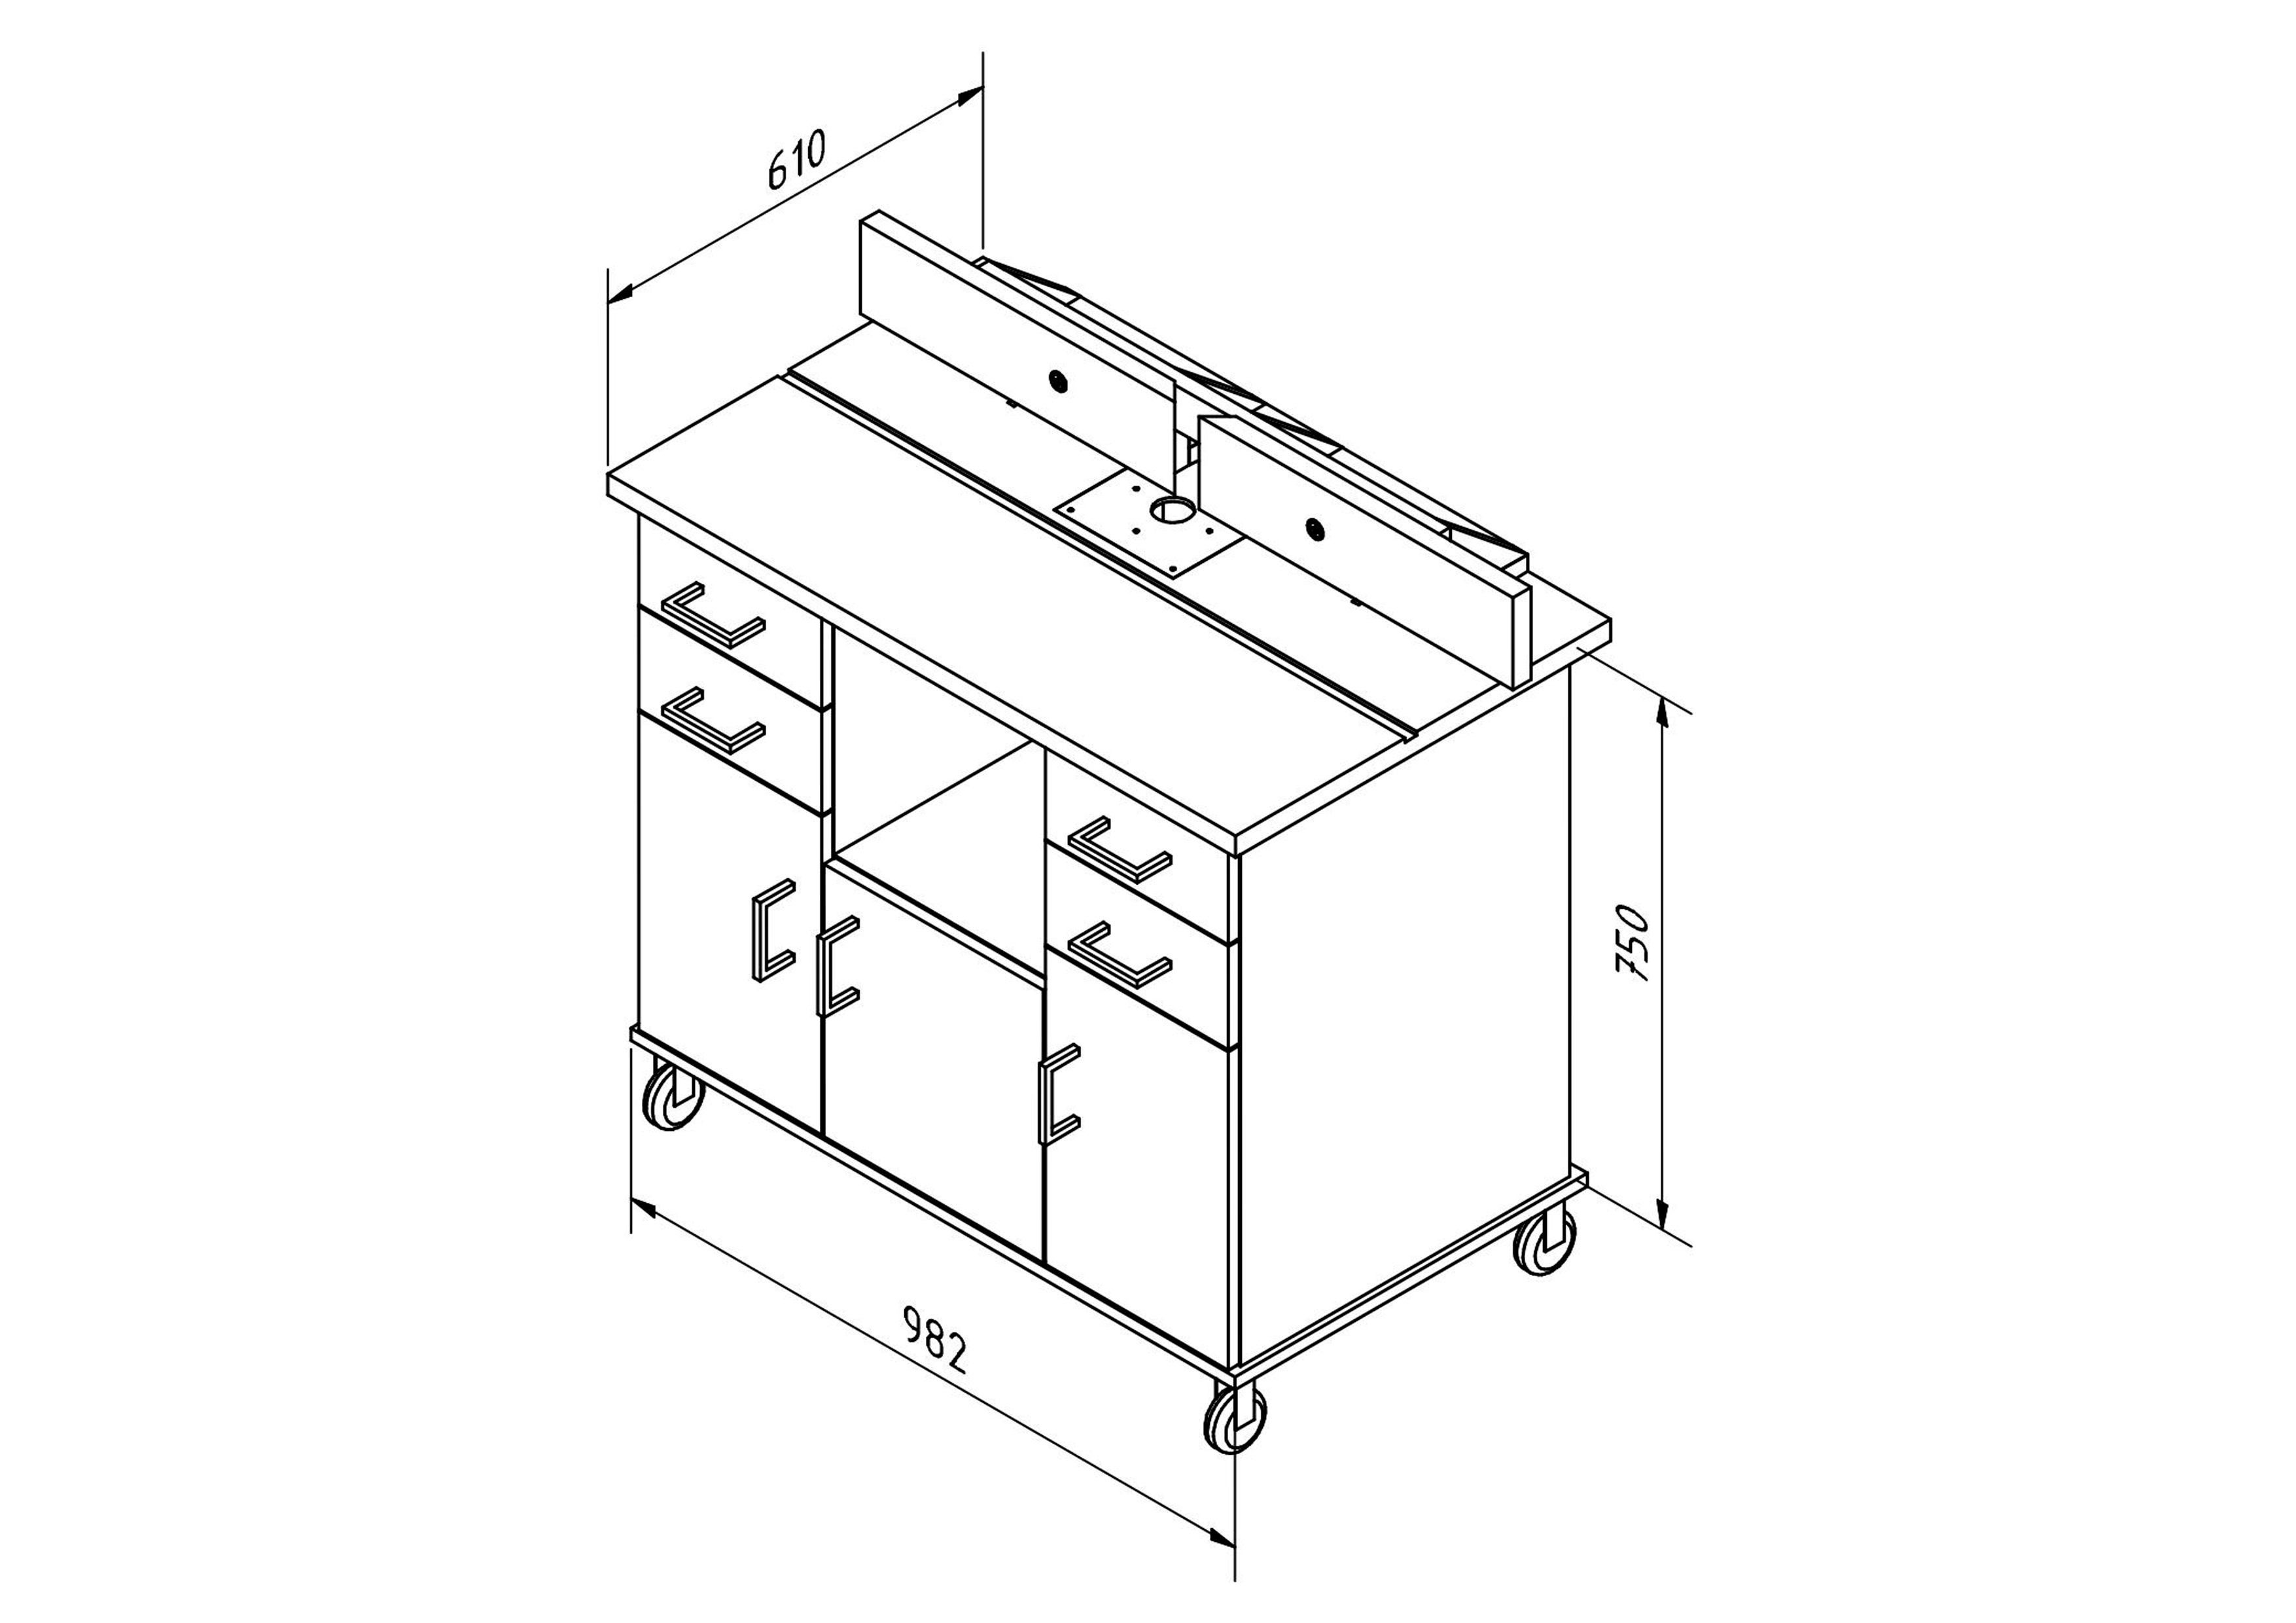 Oho mmt table-for-milling-machine-bed-1020-mm 0000.jpg